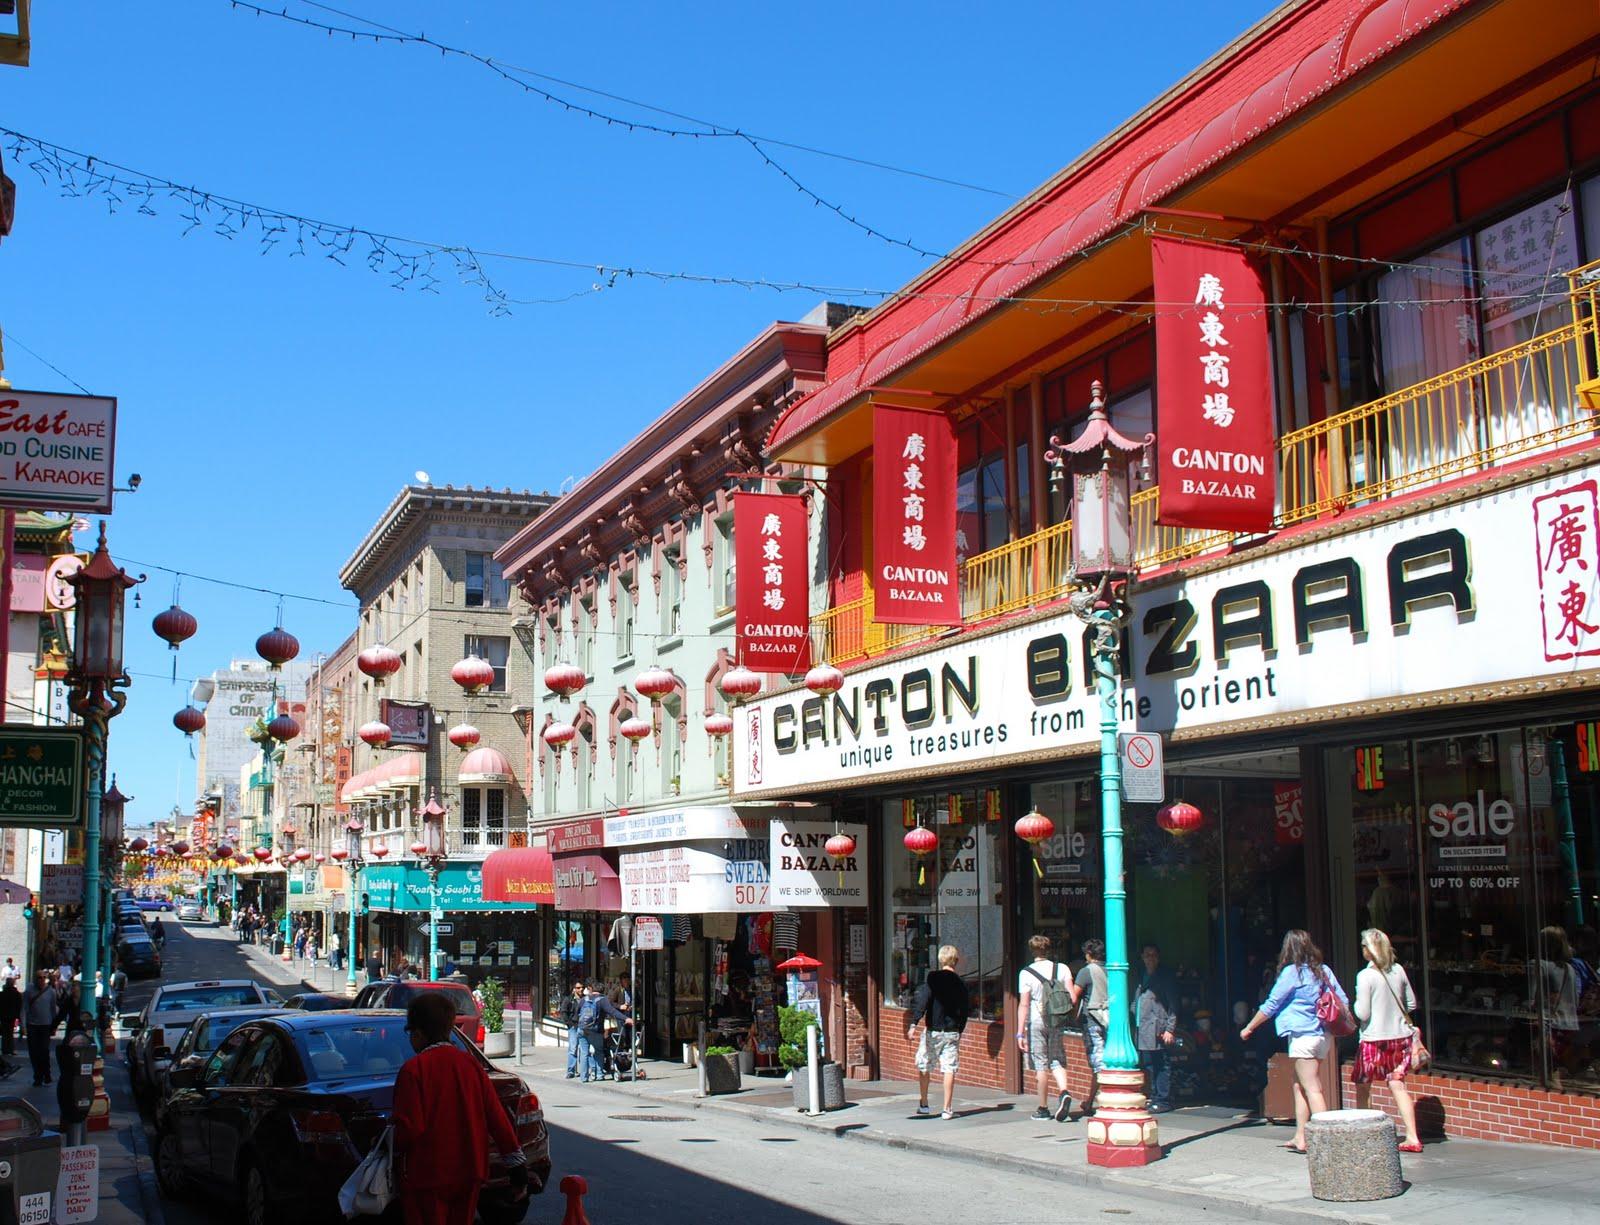 Mille Fiori Favoriti A Taste of San Franciscos Chinatown